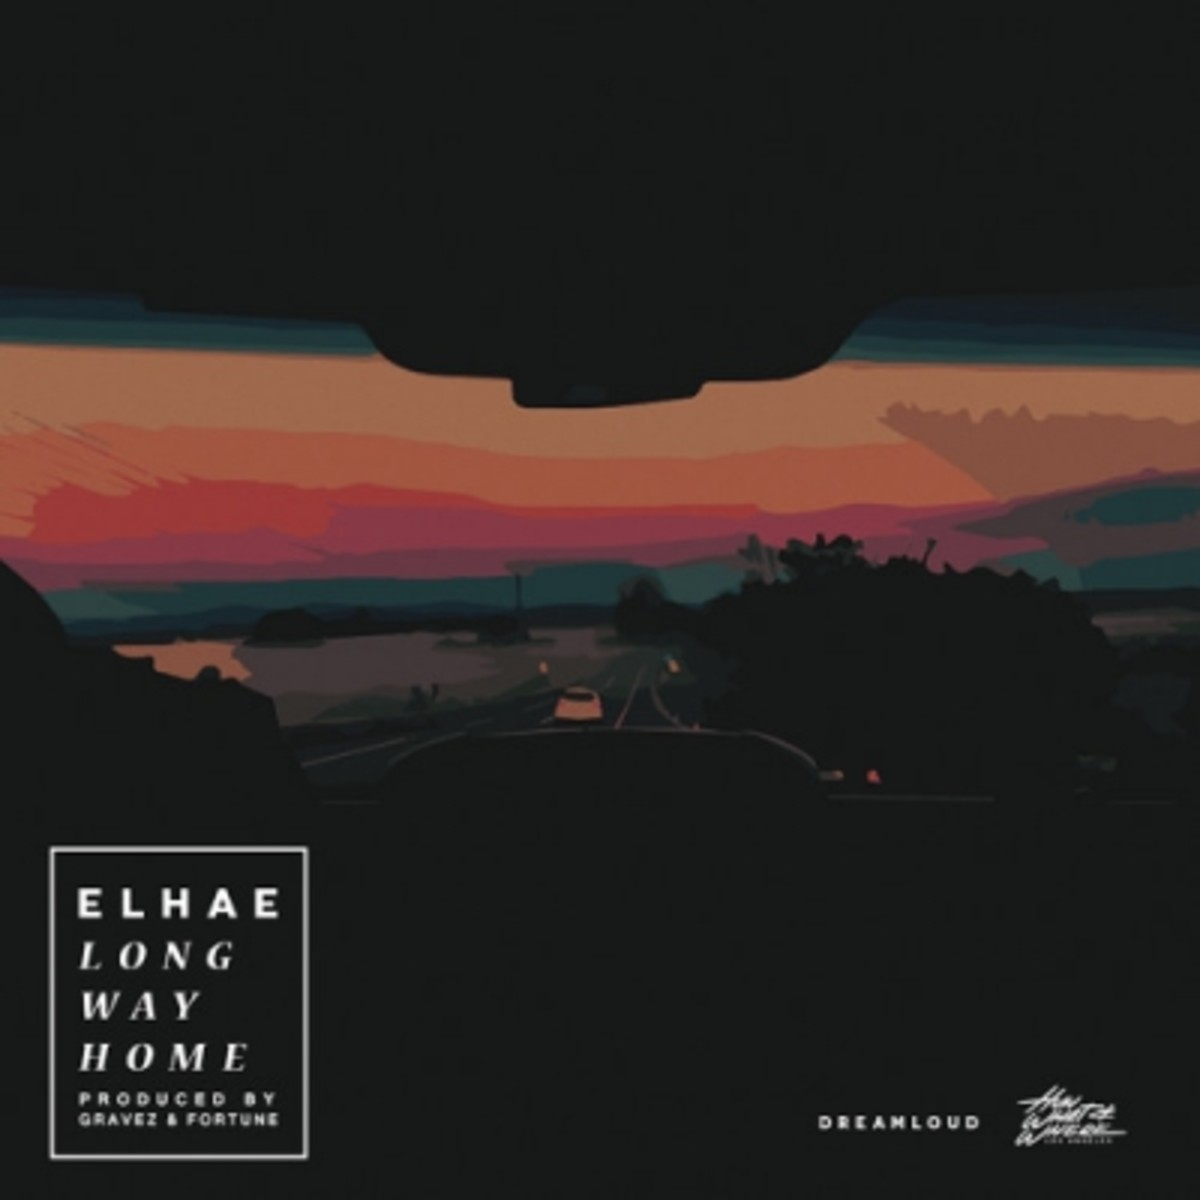 elhae-long-way-home.jpg